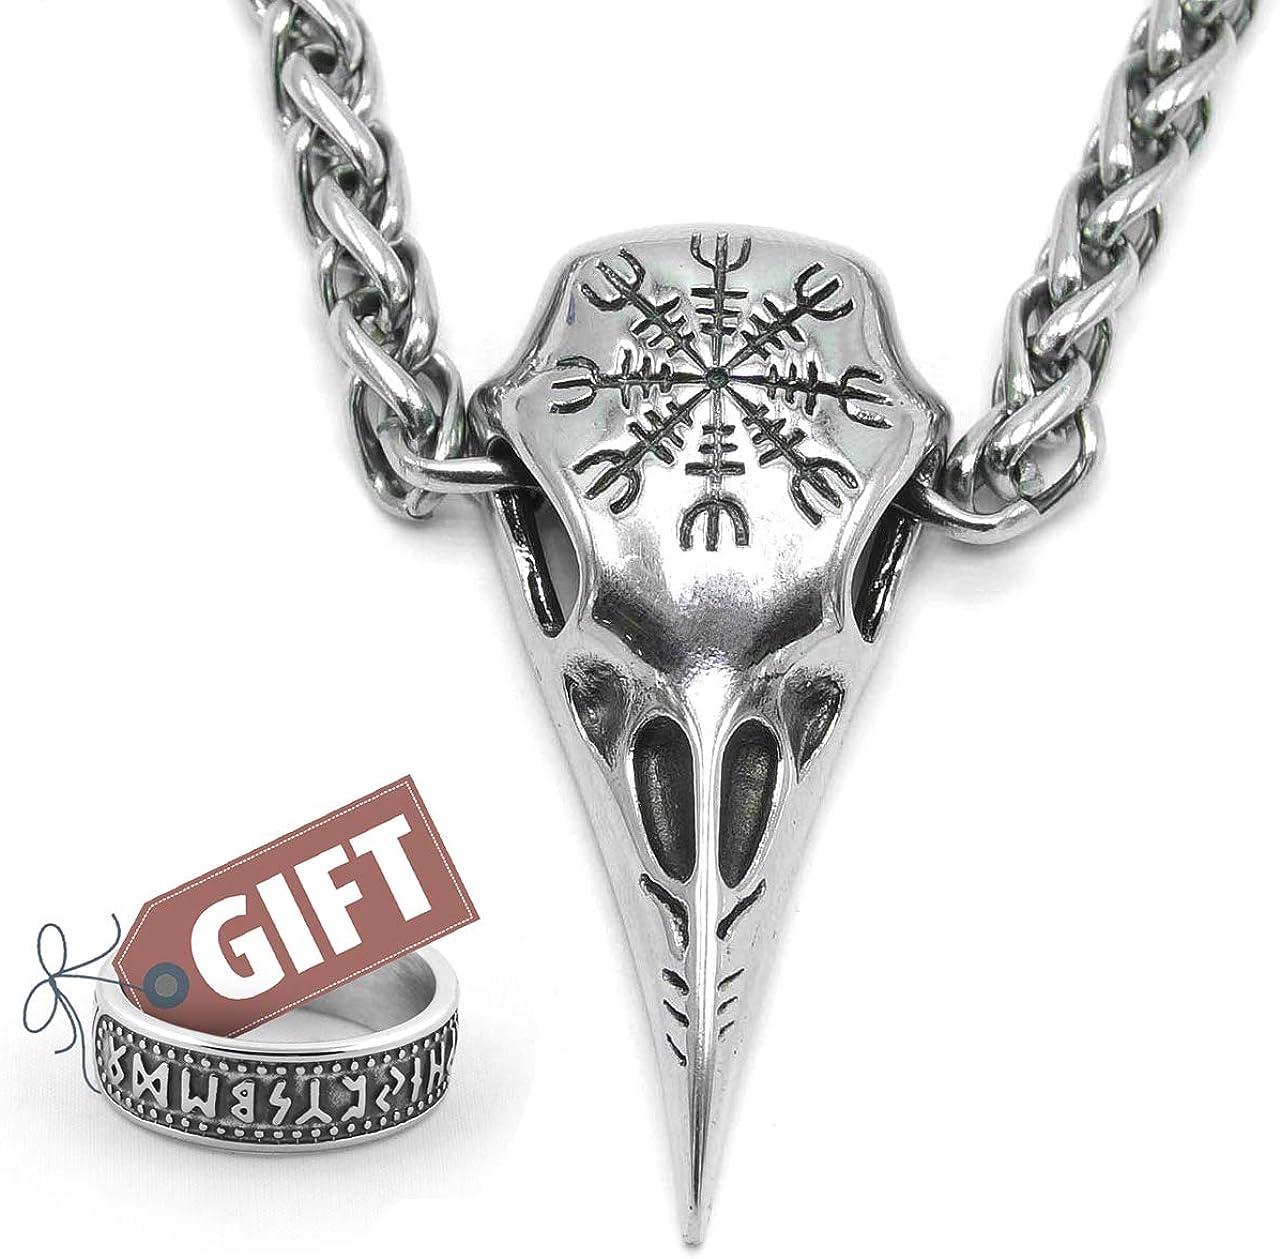 Max 49% OFF BAVIPOWER Huginn Raven Skull Necklace Pendant Seattle Mall Aegishjalmur with